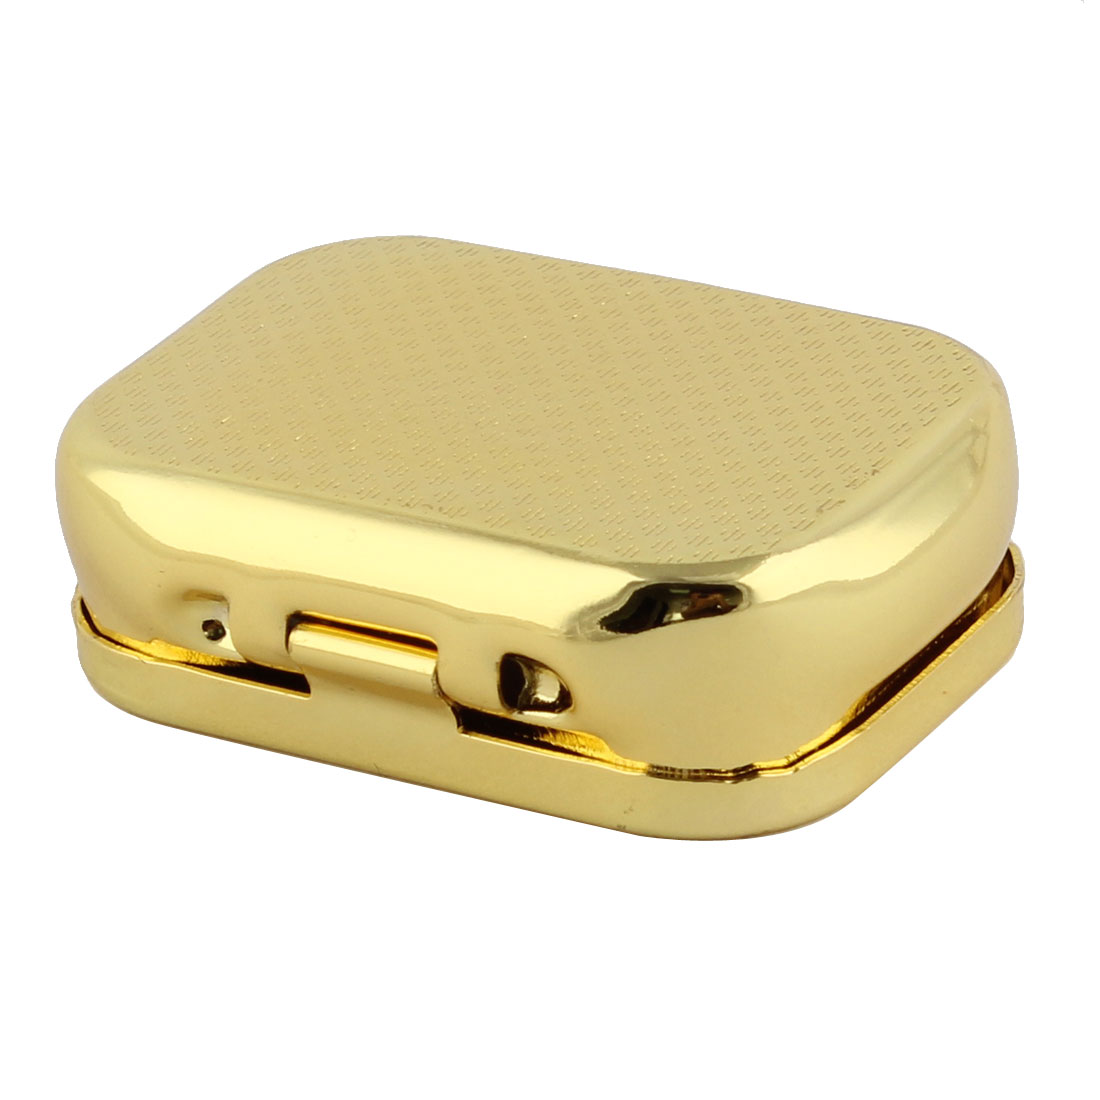 Metal Rectangle 2 Grid Detachable Pill Organizer Storage Case Gold Tone